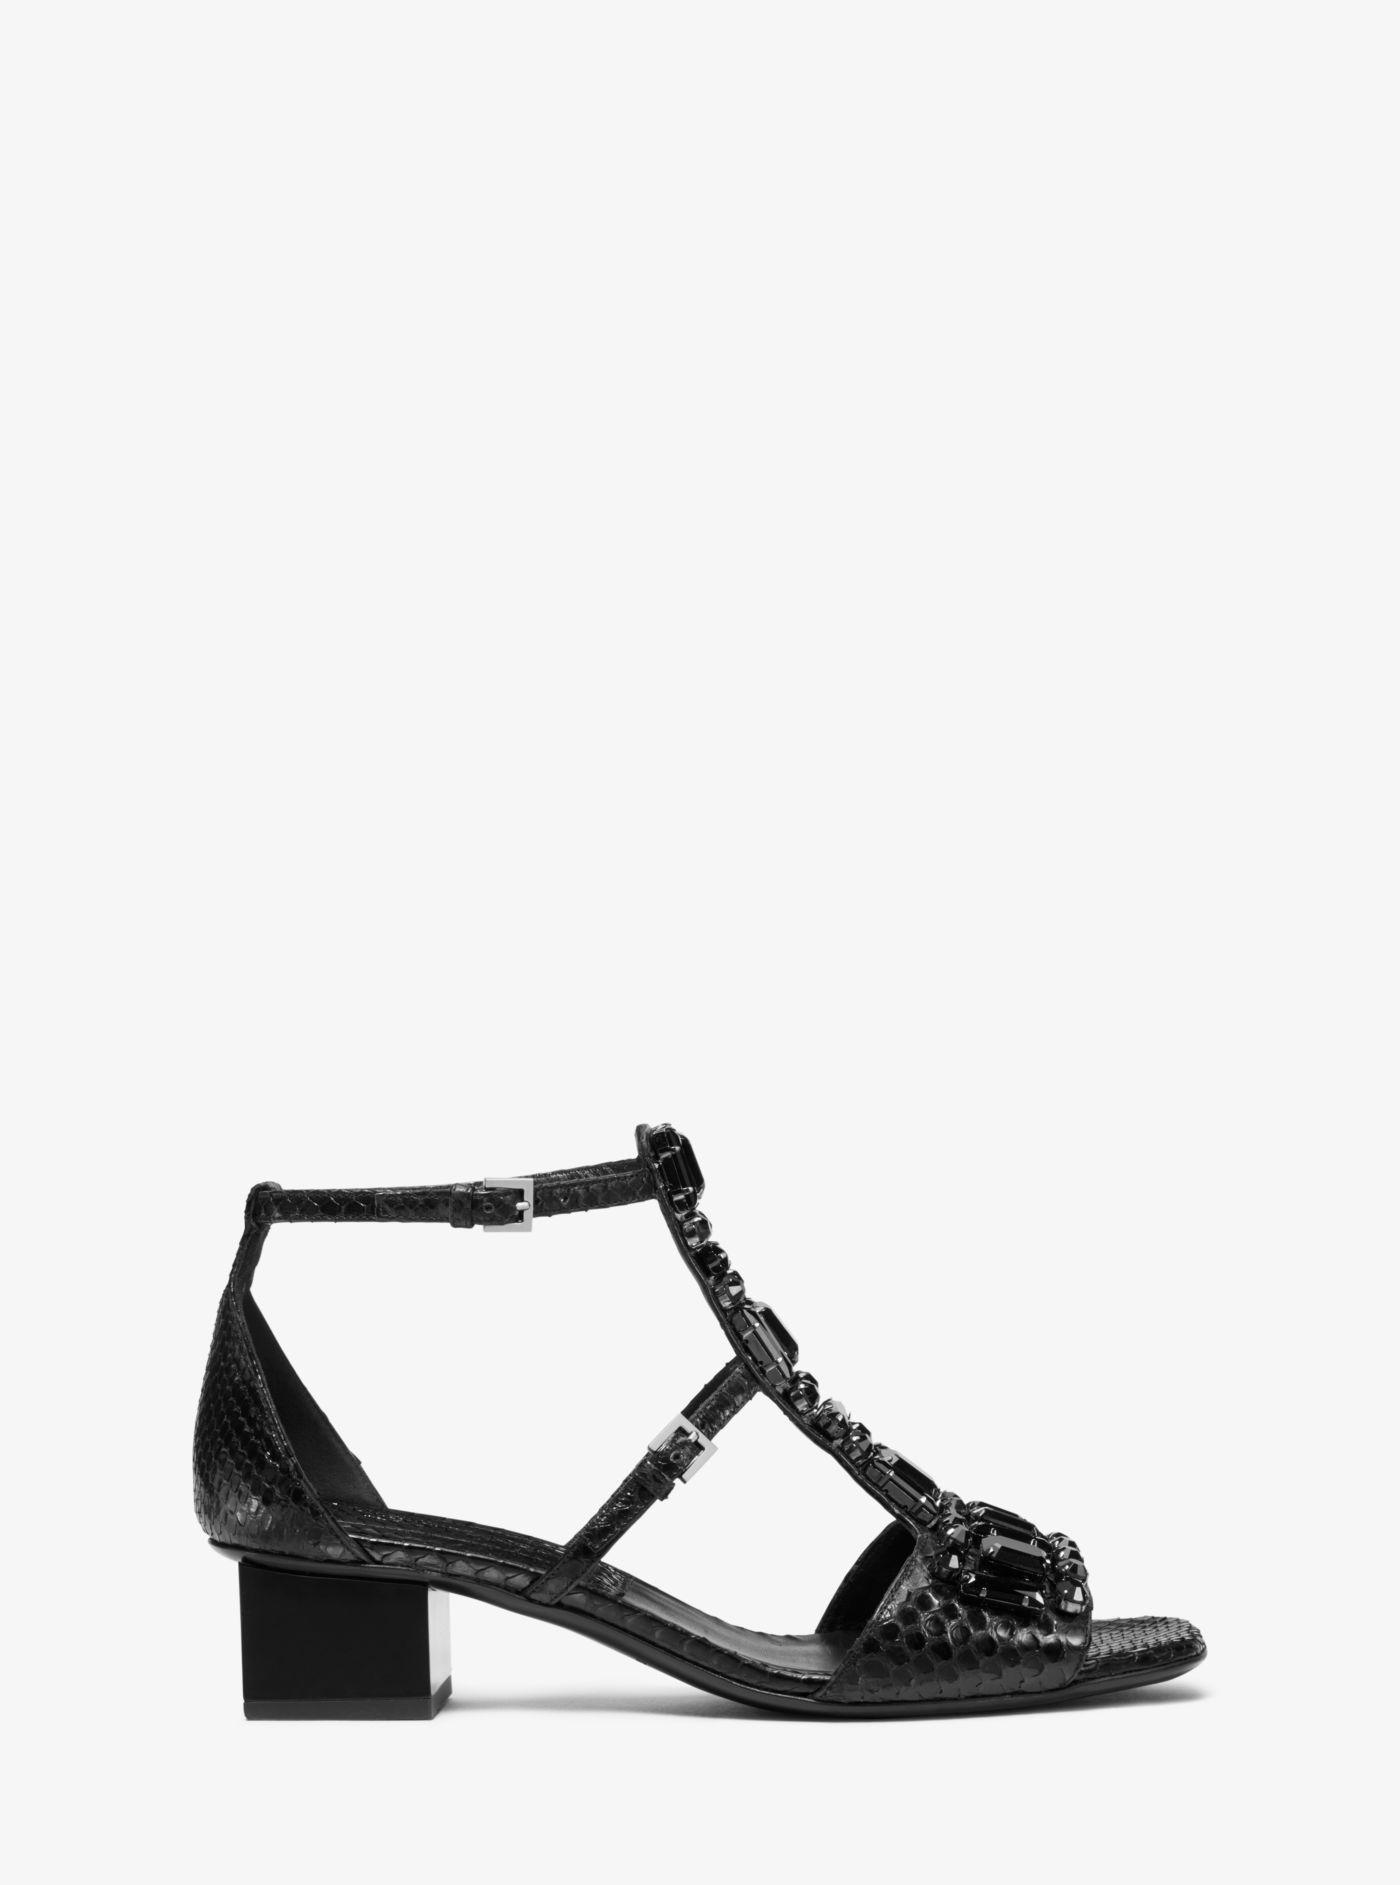 4b2b6aa08f33 Michael Kors - Black Cecile Crystal Embellished Snakeskin Sandal - Lyst.  View fullscreen